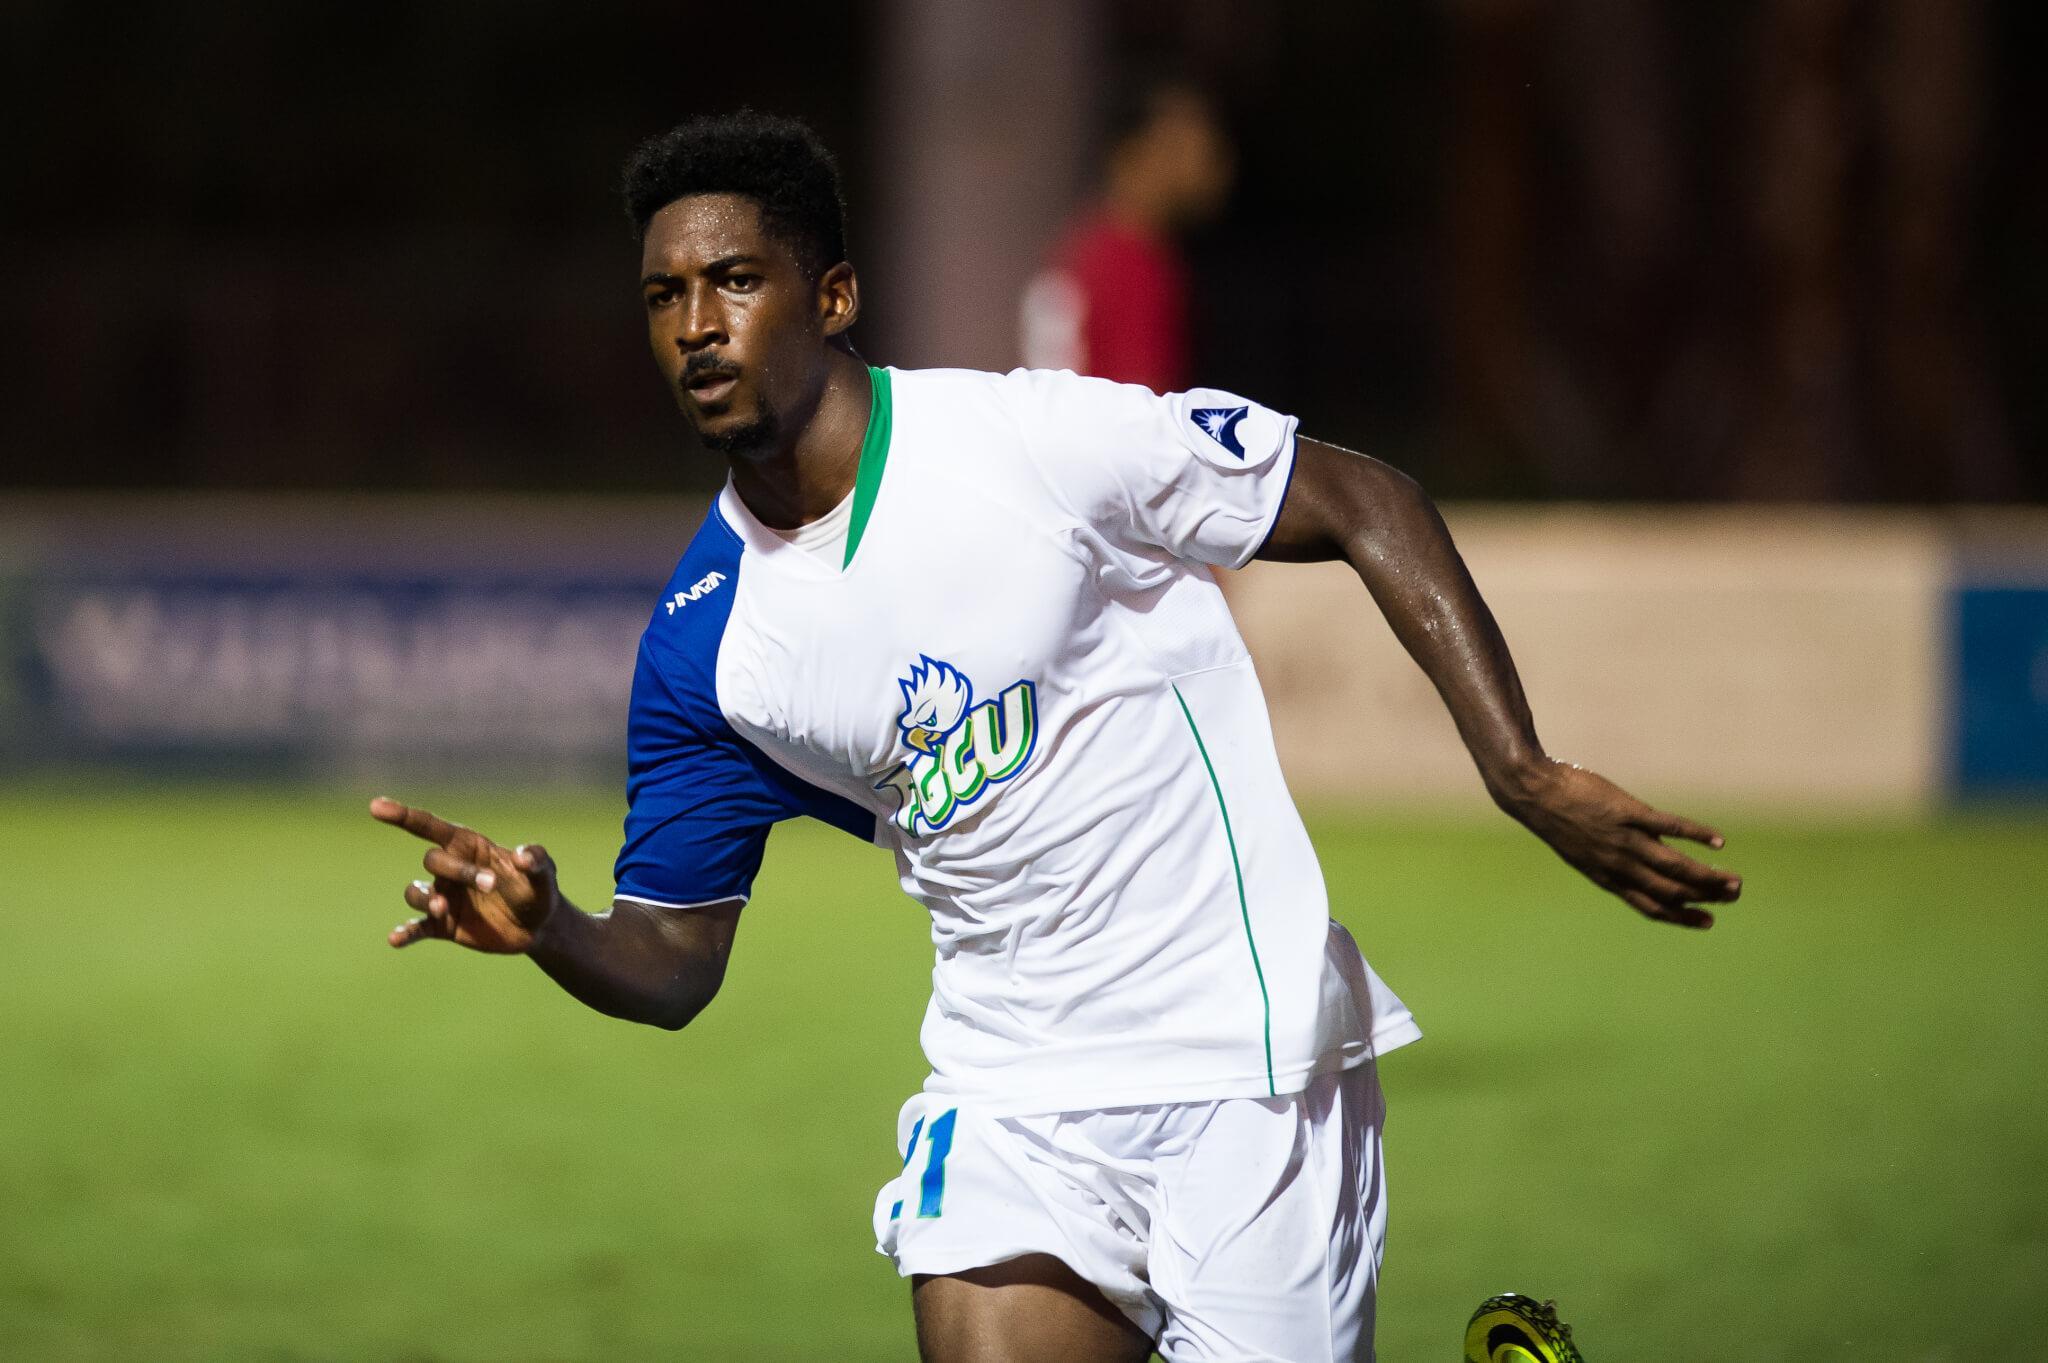 FGCU men's soccer forward, Arion Sobers-Assue, comes back stronger as redshirt sophomore